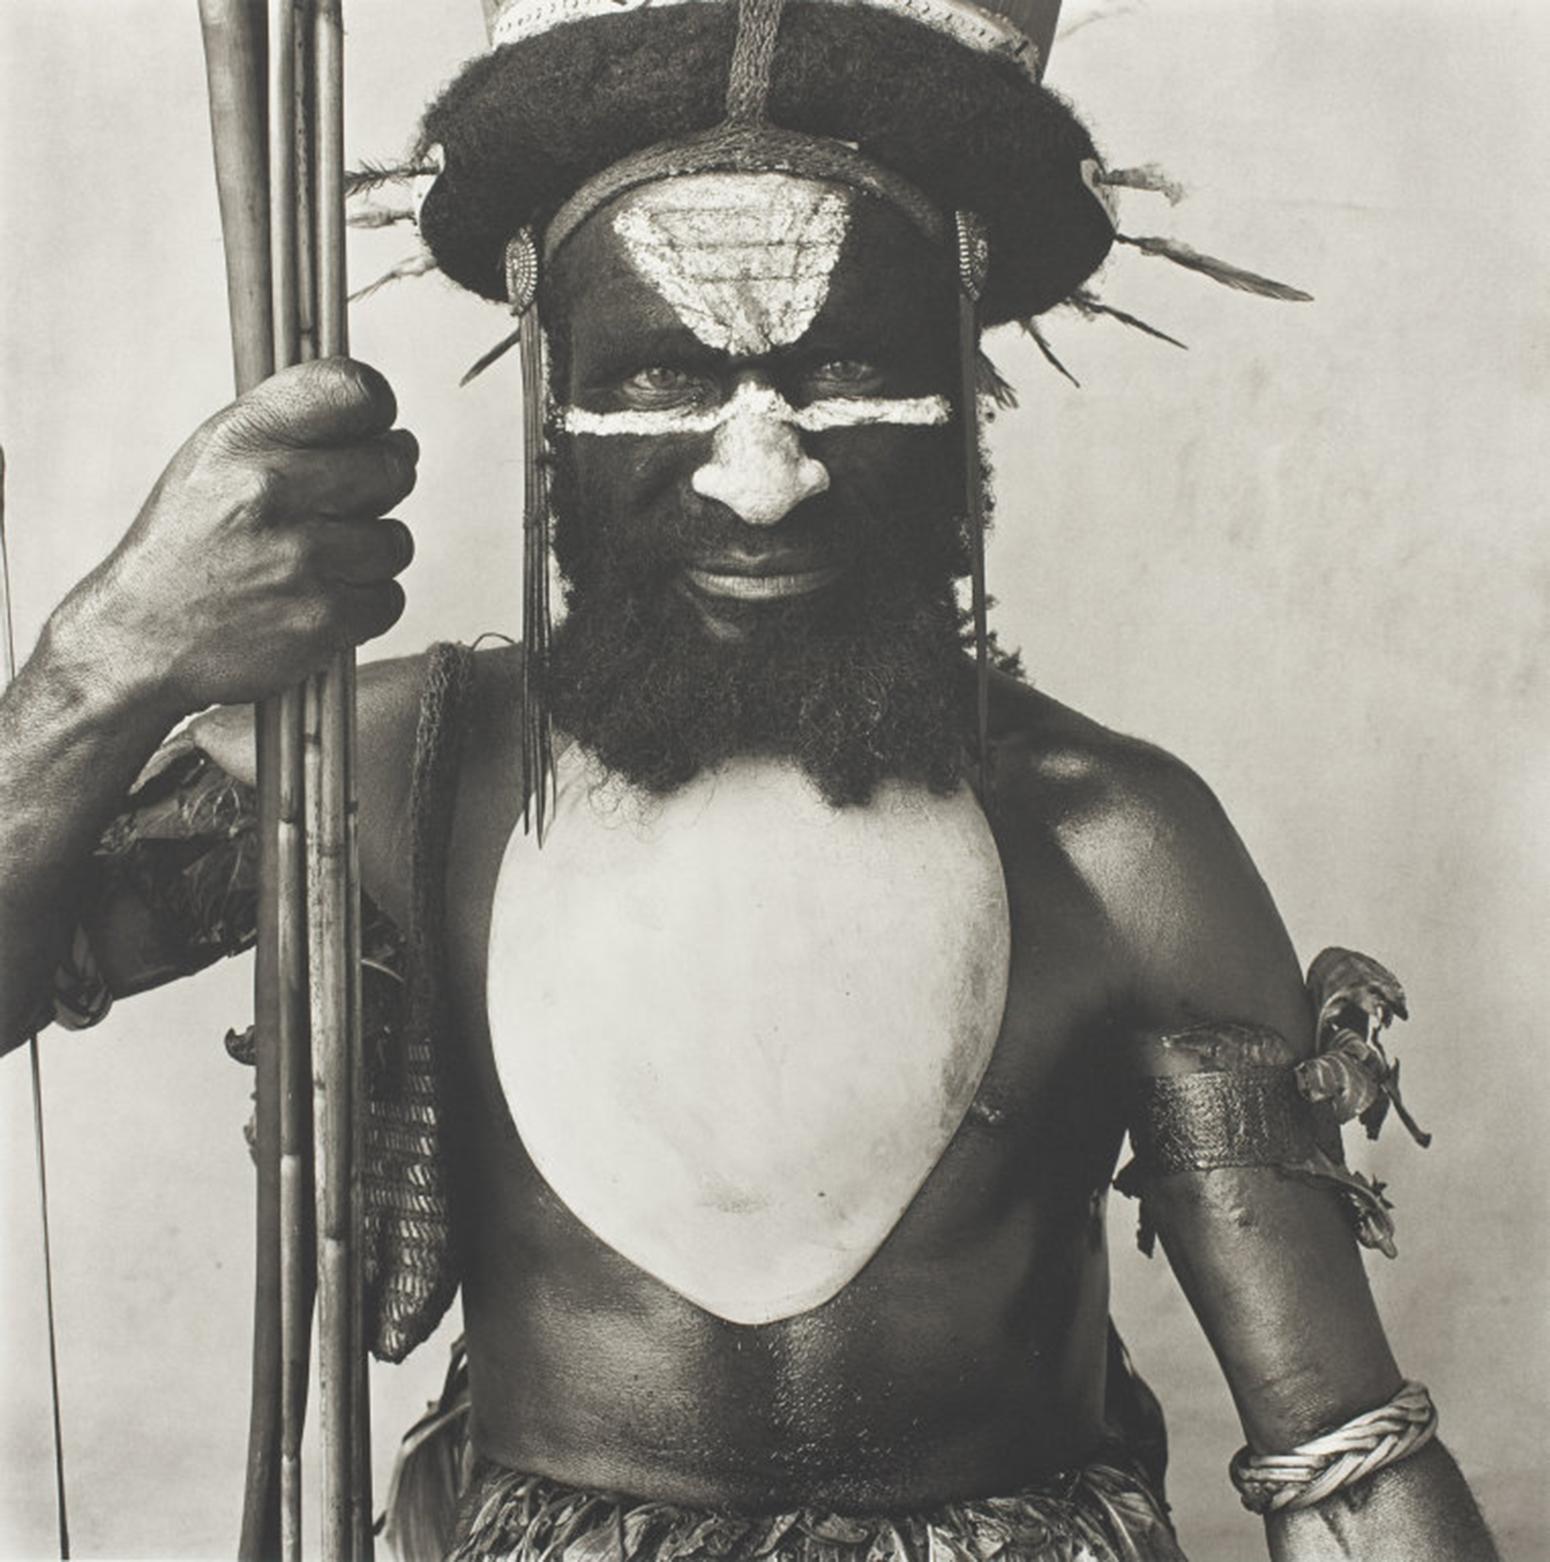 Tambul Warrior by Irving Penn